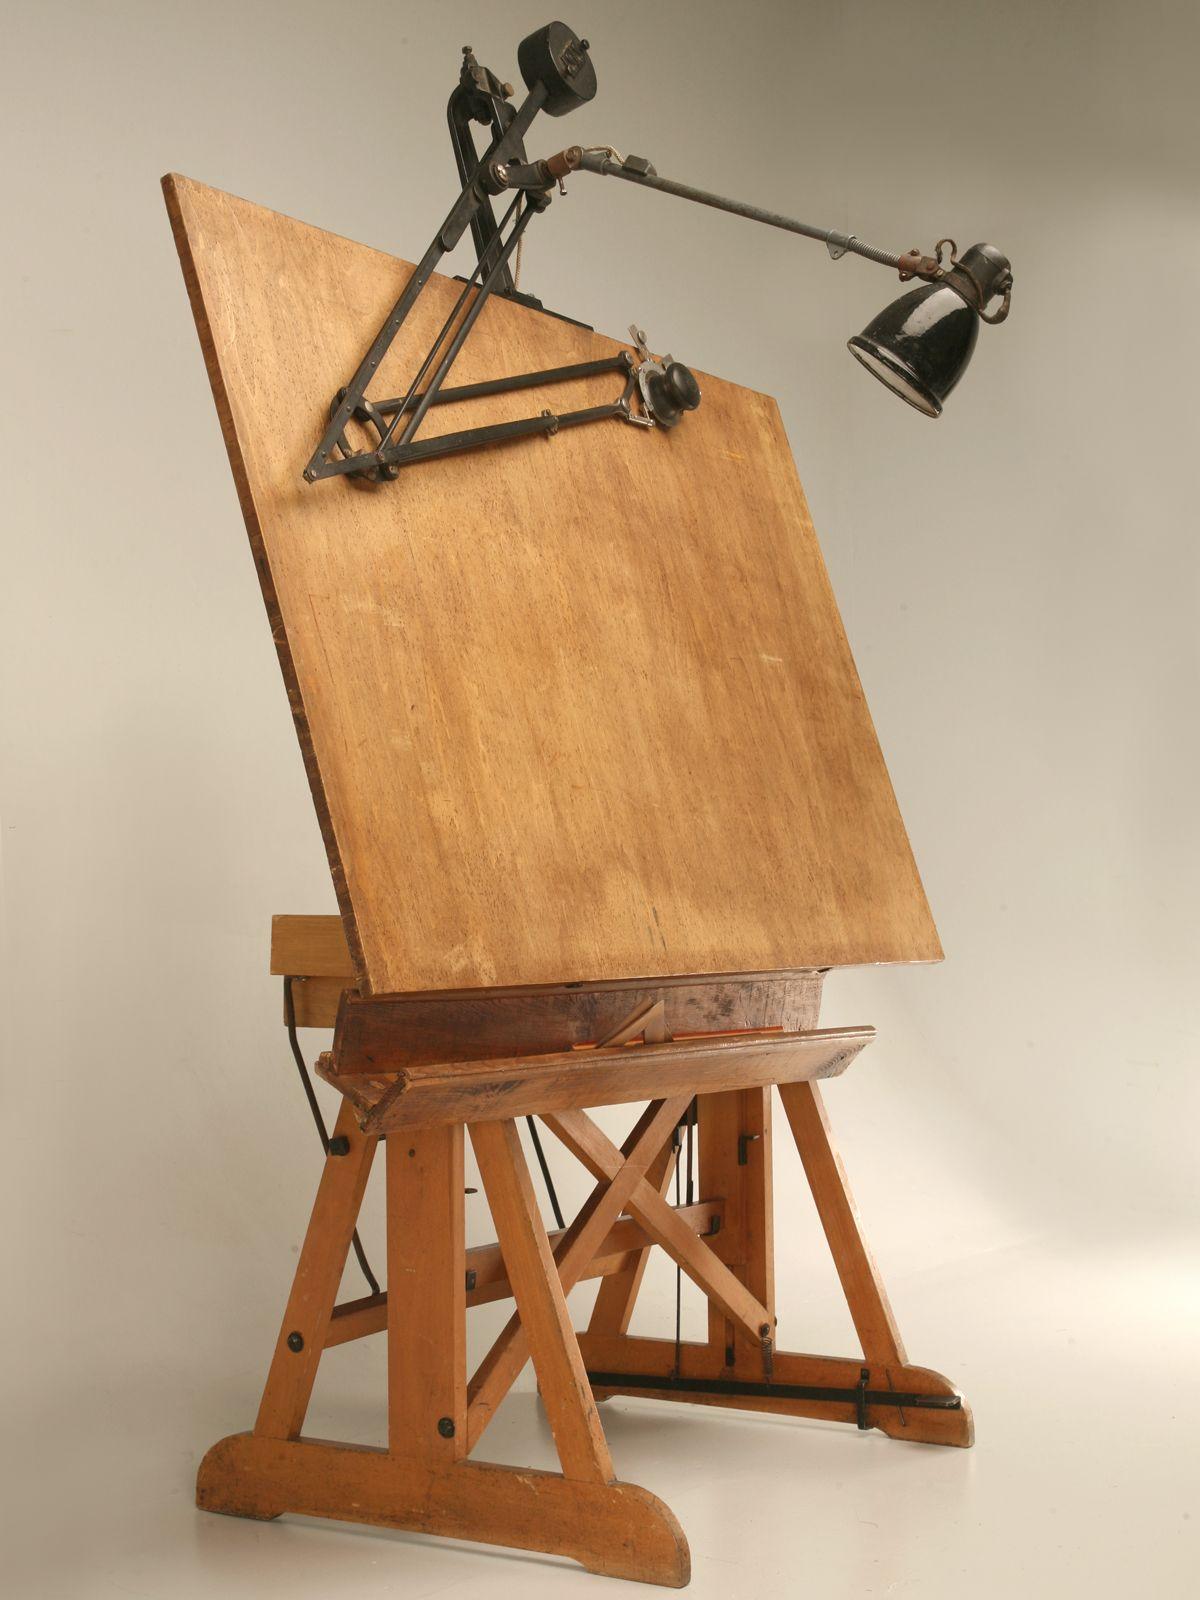 Paul david wilson caballetes mesas de arquitectura - Mesas de arquitectura ...